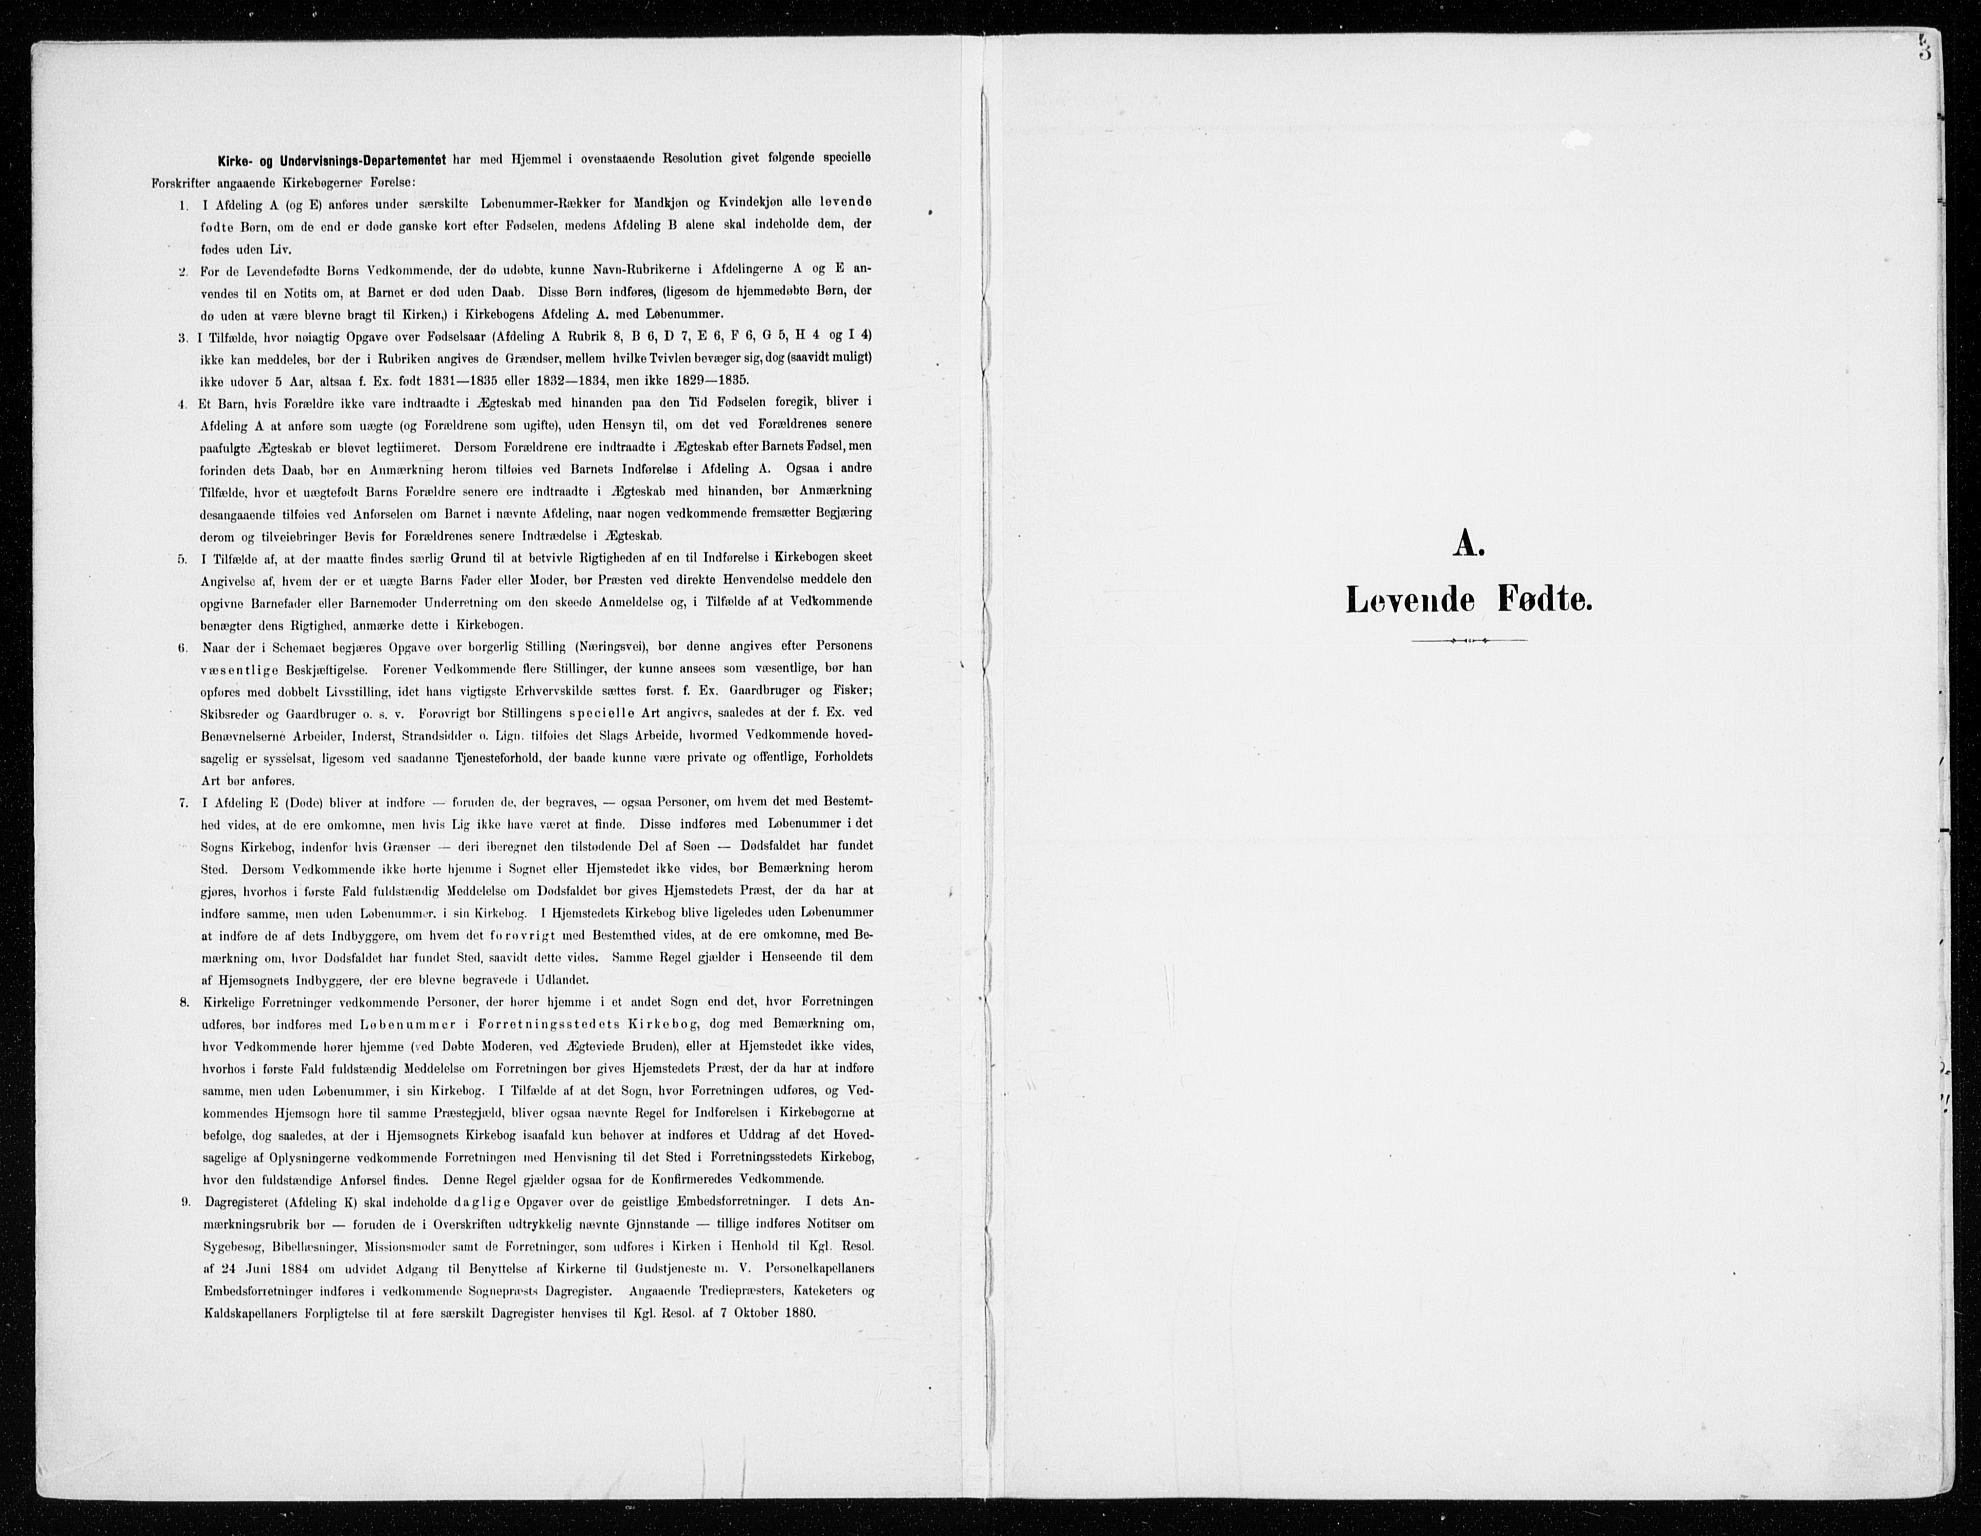 SAH, Fåberg prestekontor, H/Ha/Haa/L0011: Parish register (official) no. 11, 1899-1913, p. 3